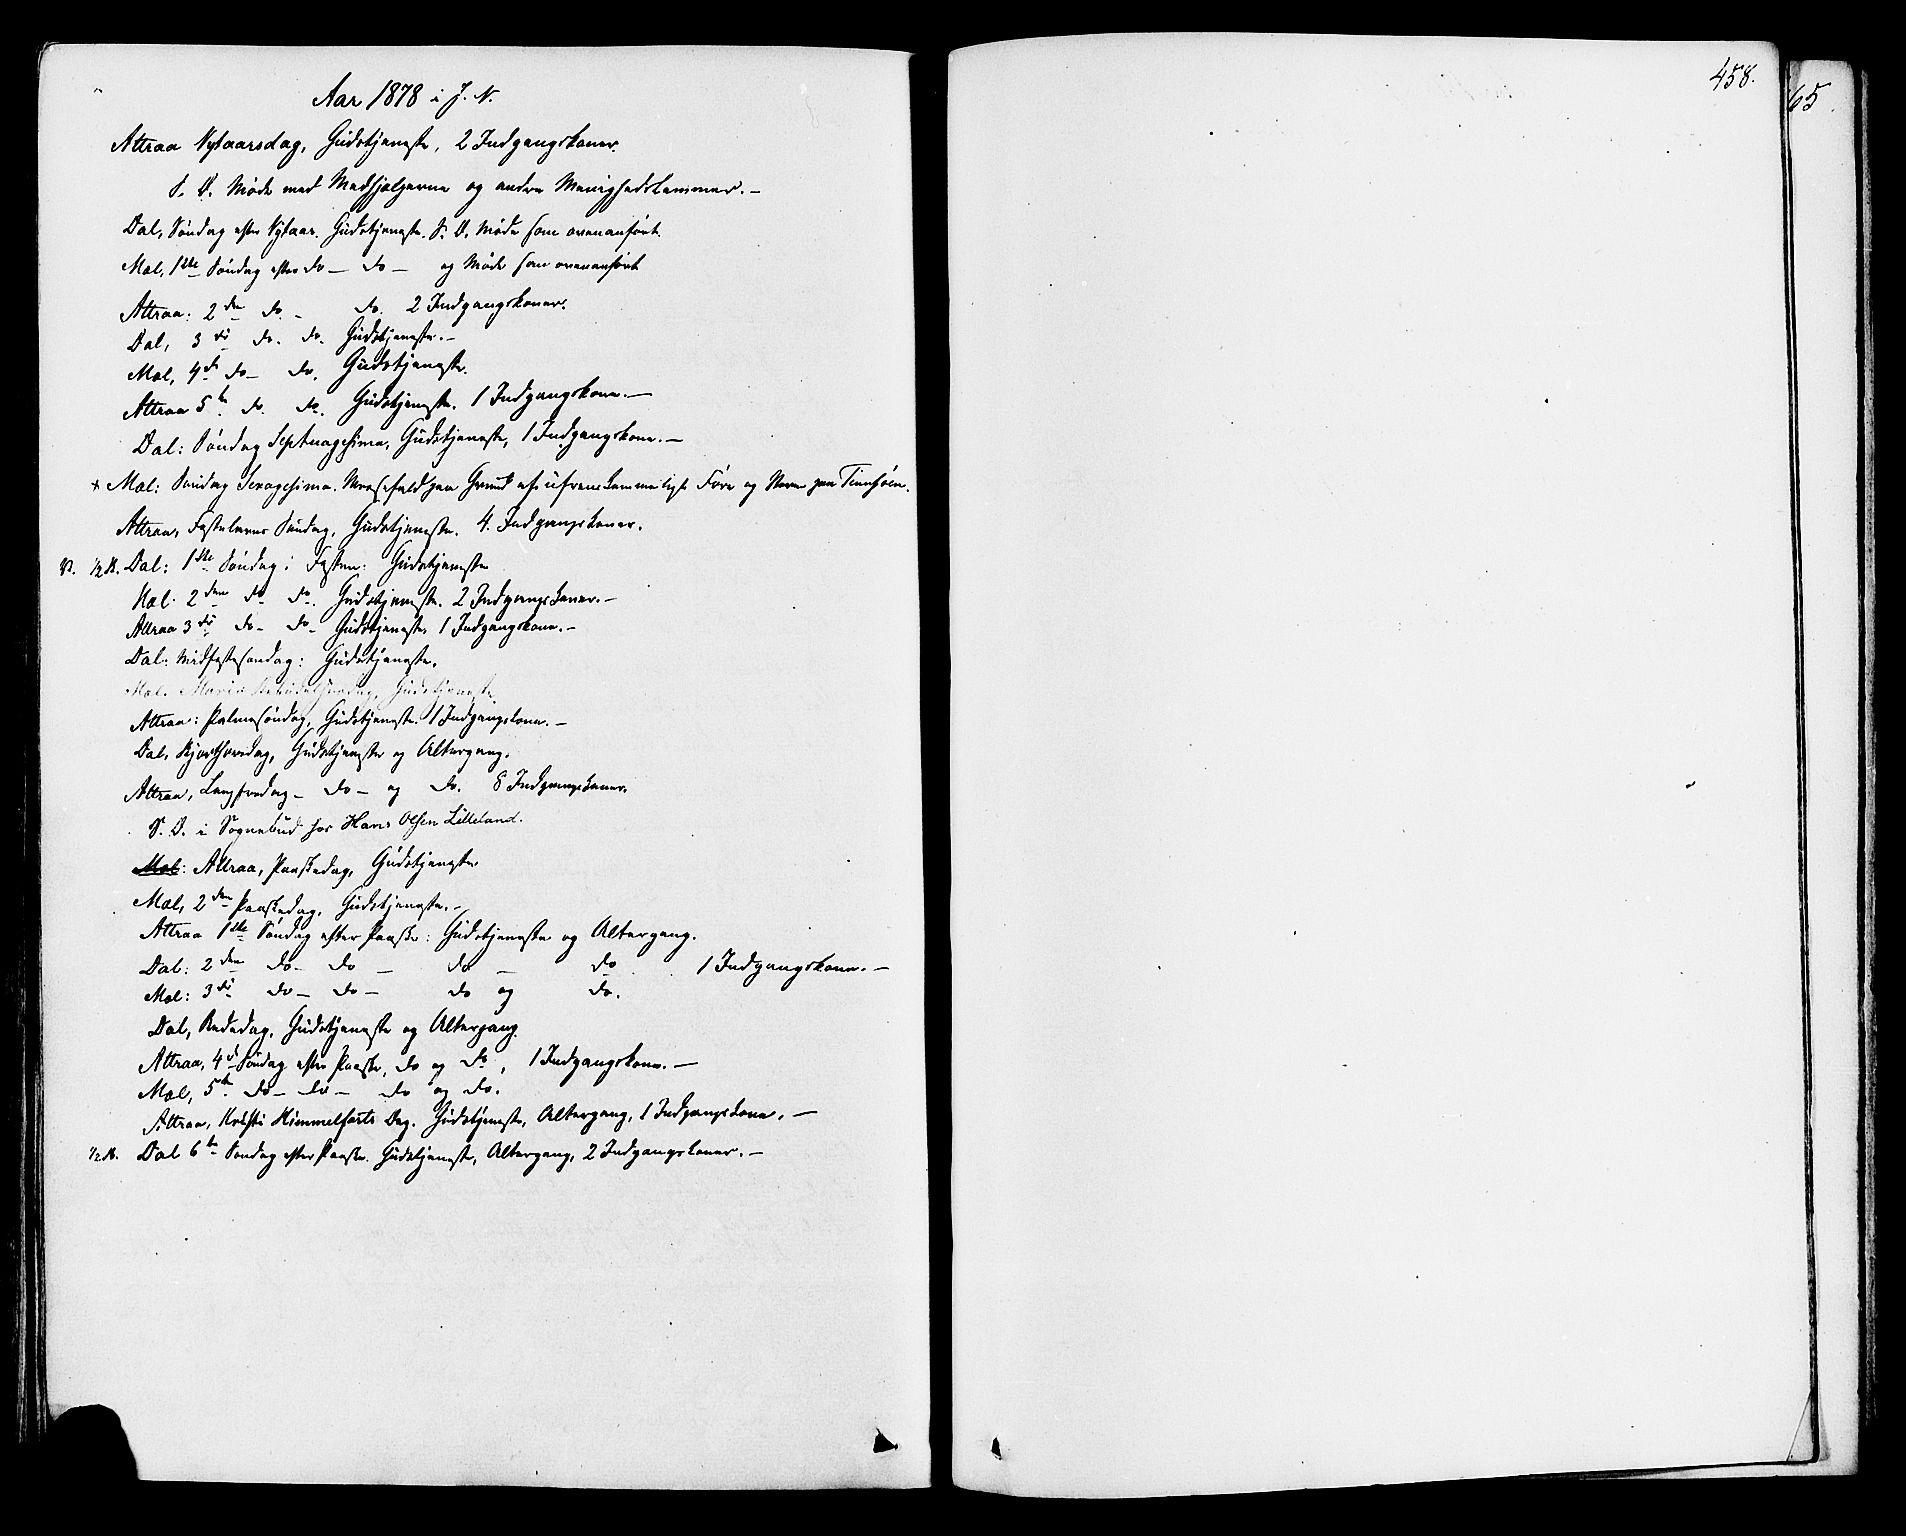 SAKO, Tinn kirkebøker, F/Fa/L0006: Ministerialbok nr. I 6, 1857-1878, s. 458